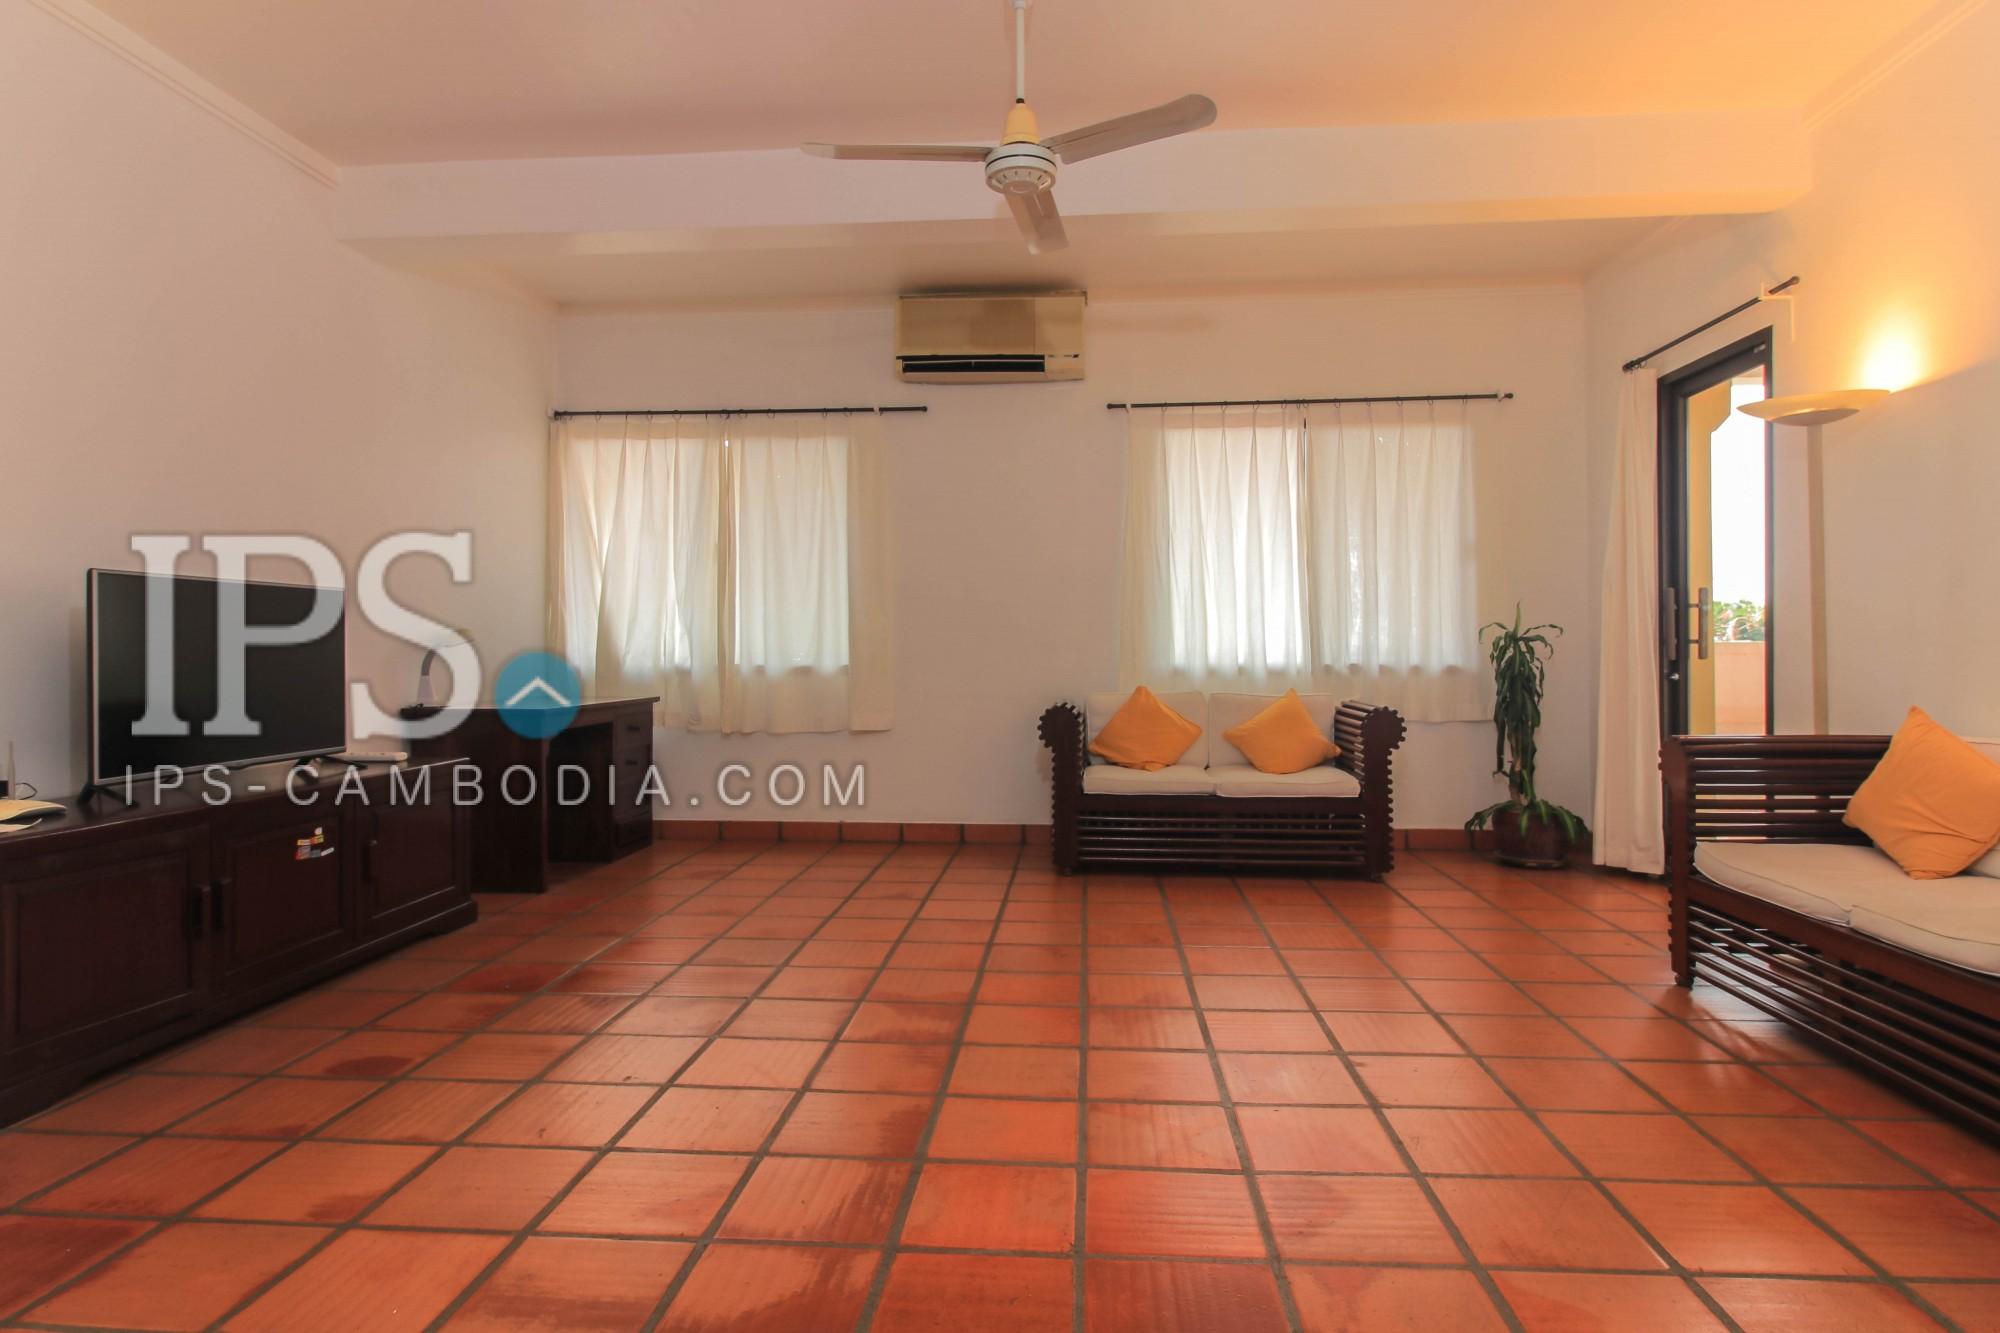 1 Bedroom Services Apartment For Rent - Tonle Bassac, Phnom Penh